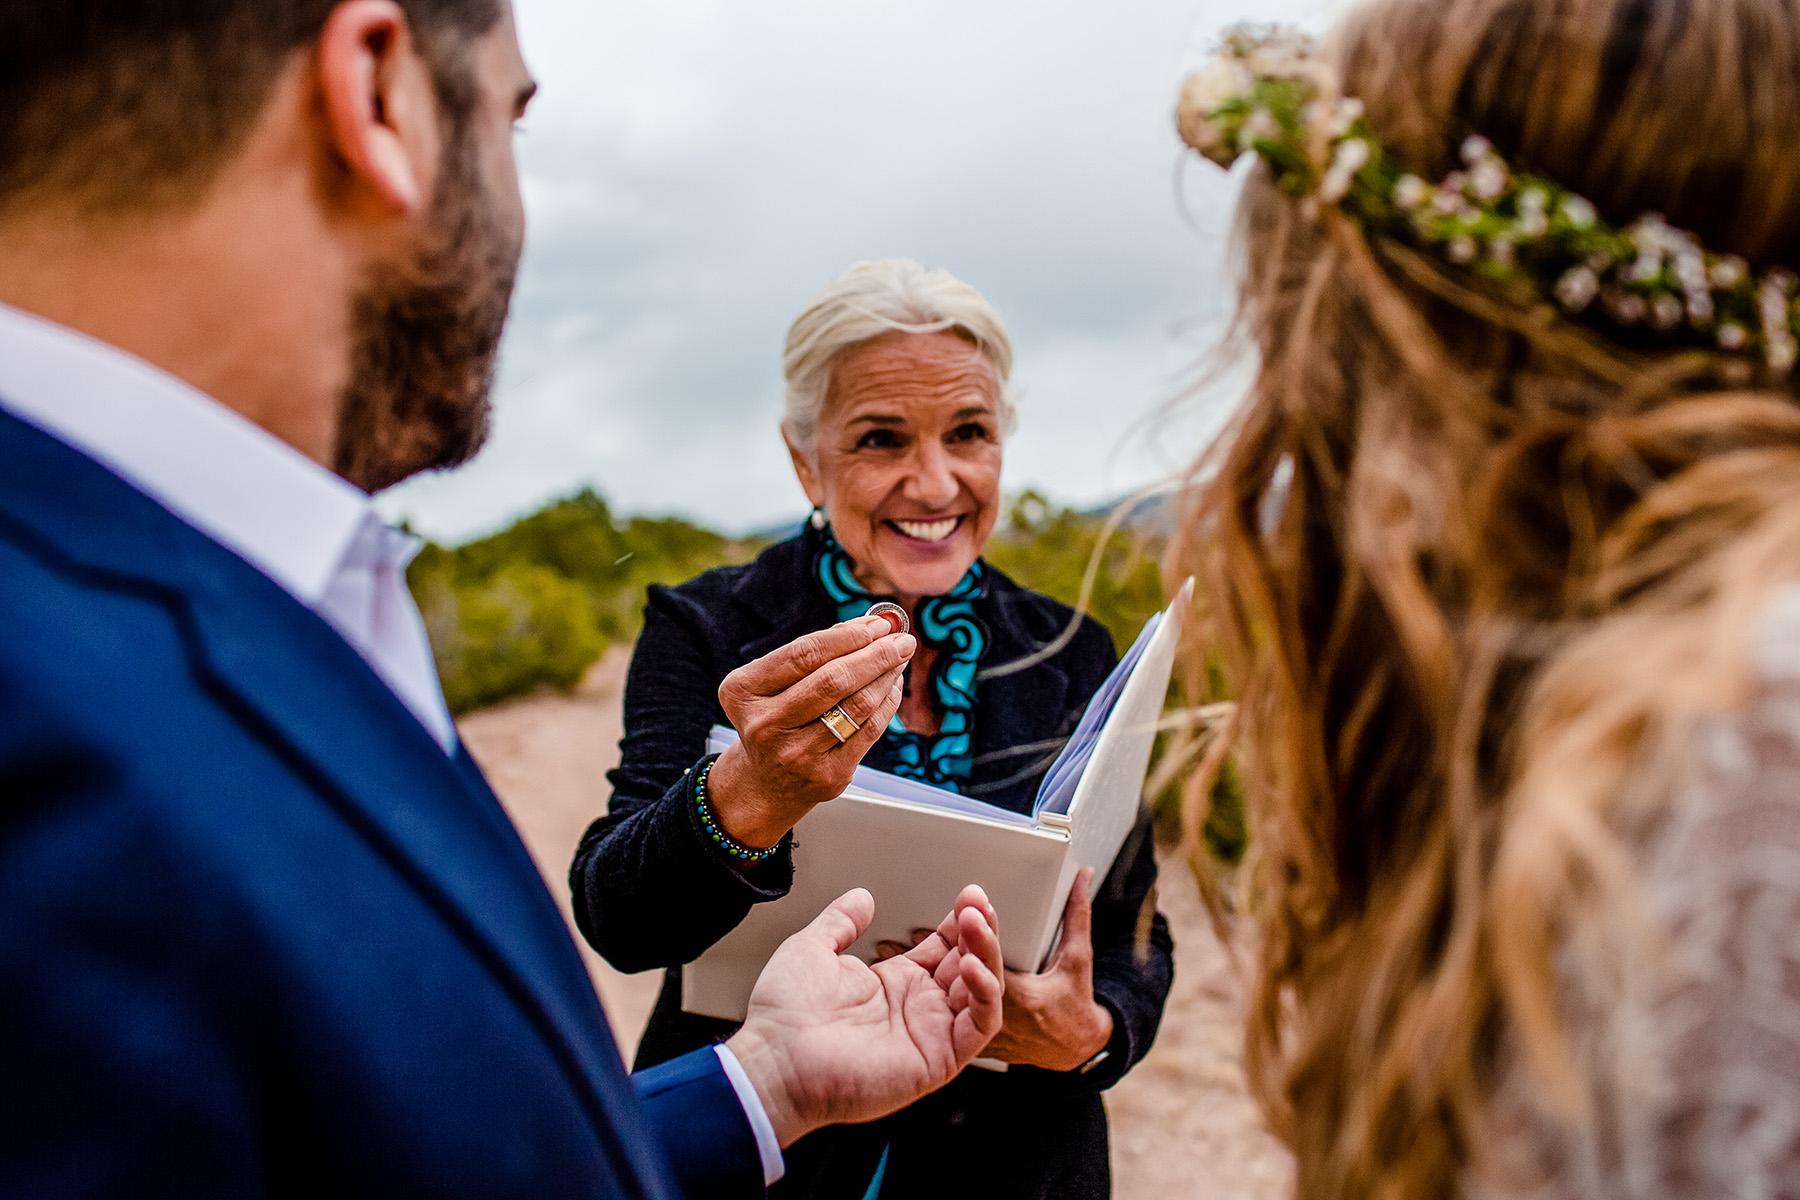 Melinda-Dustin-wedding-four-seasons-resort-santa-fe-new-mexico-1012